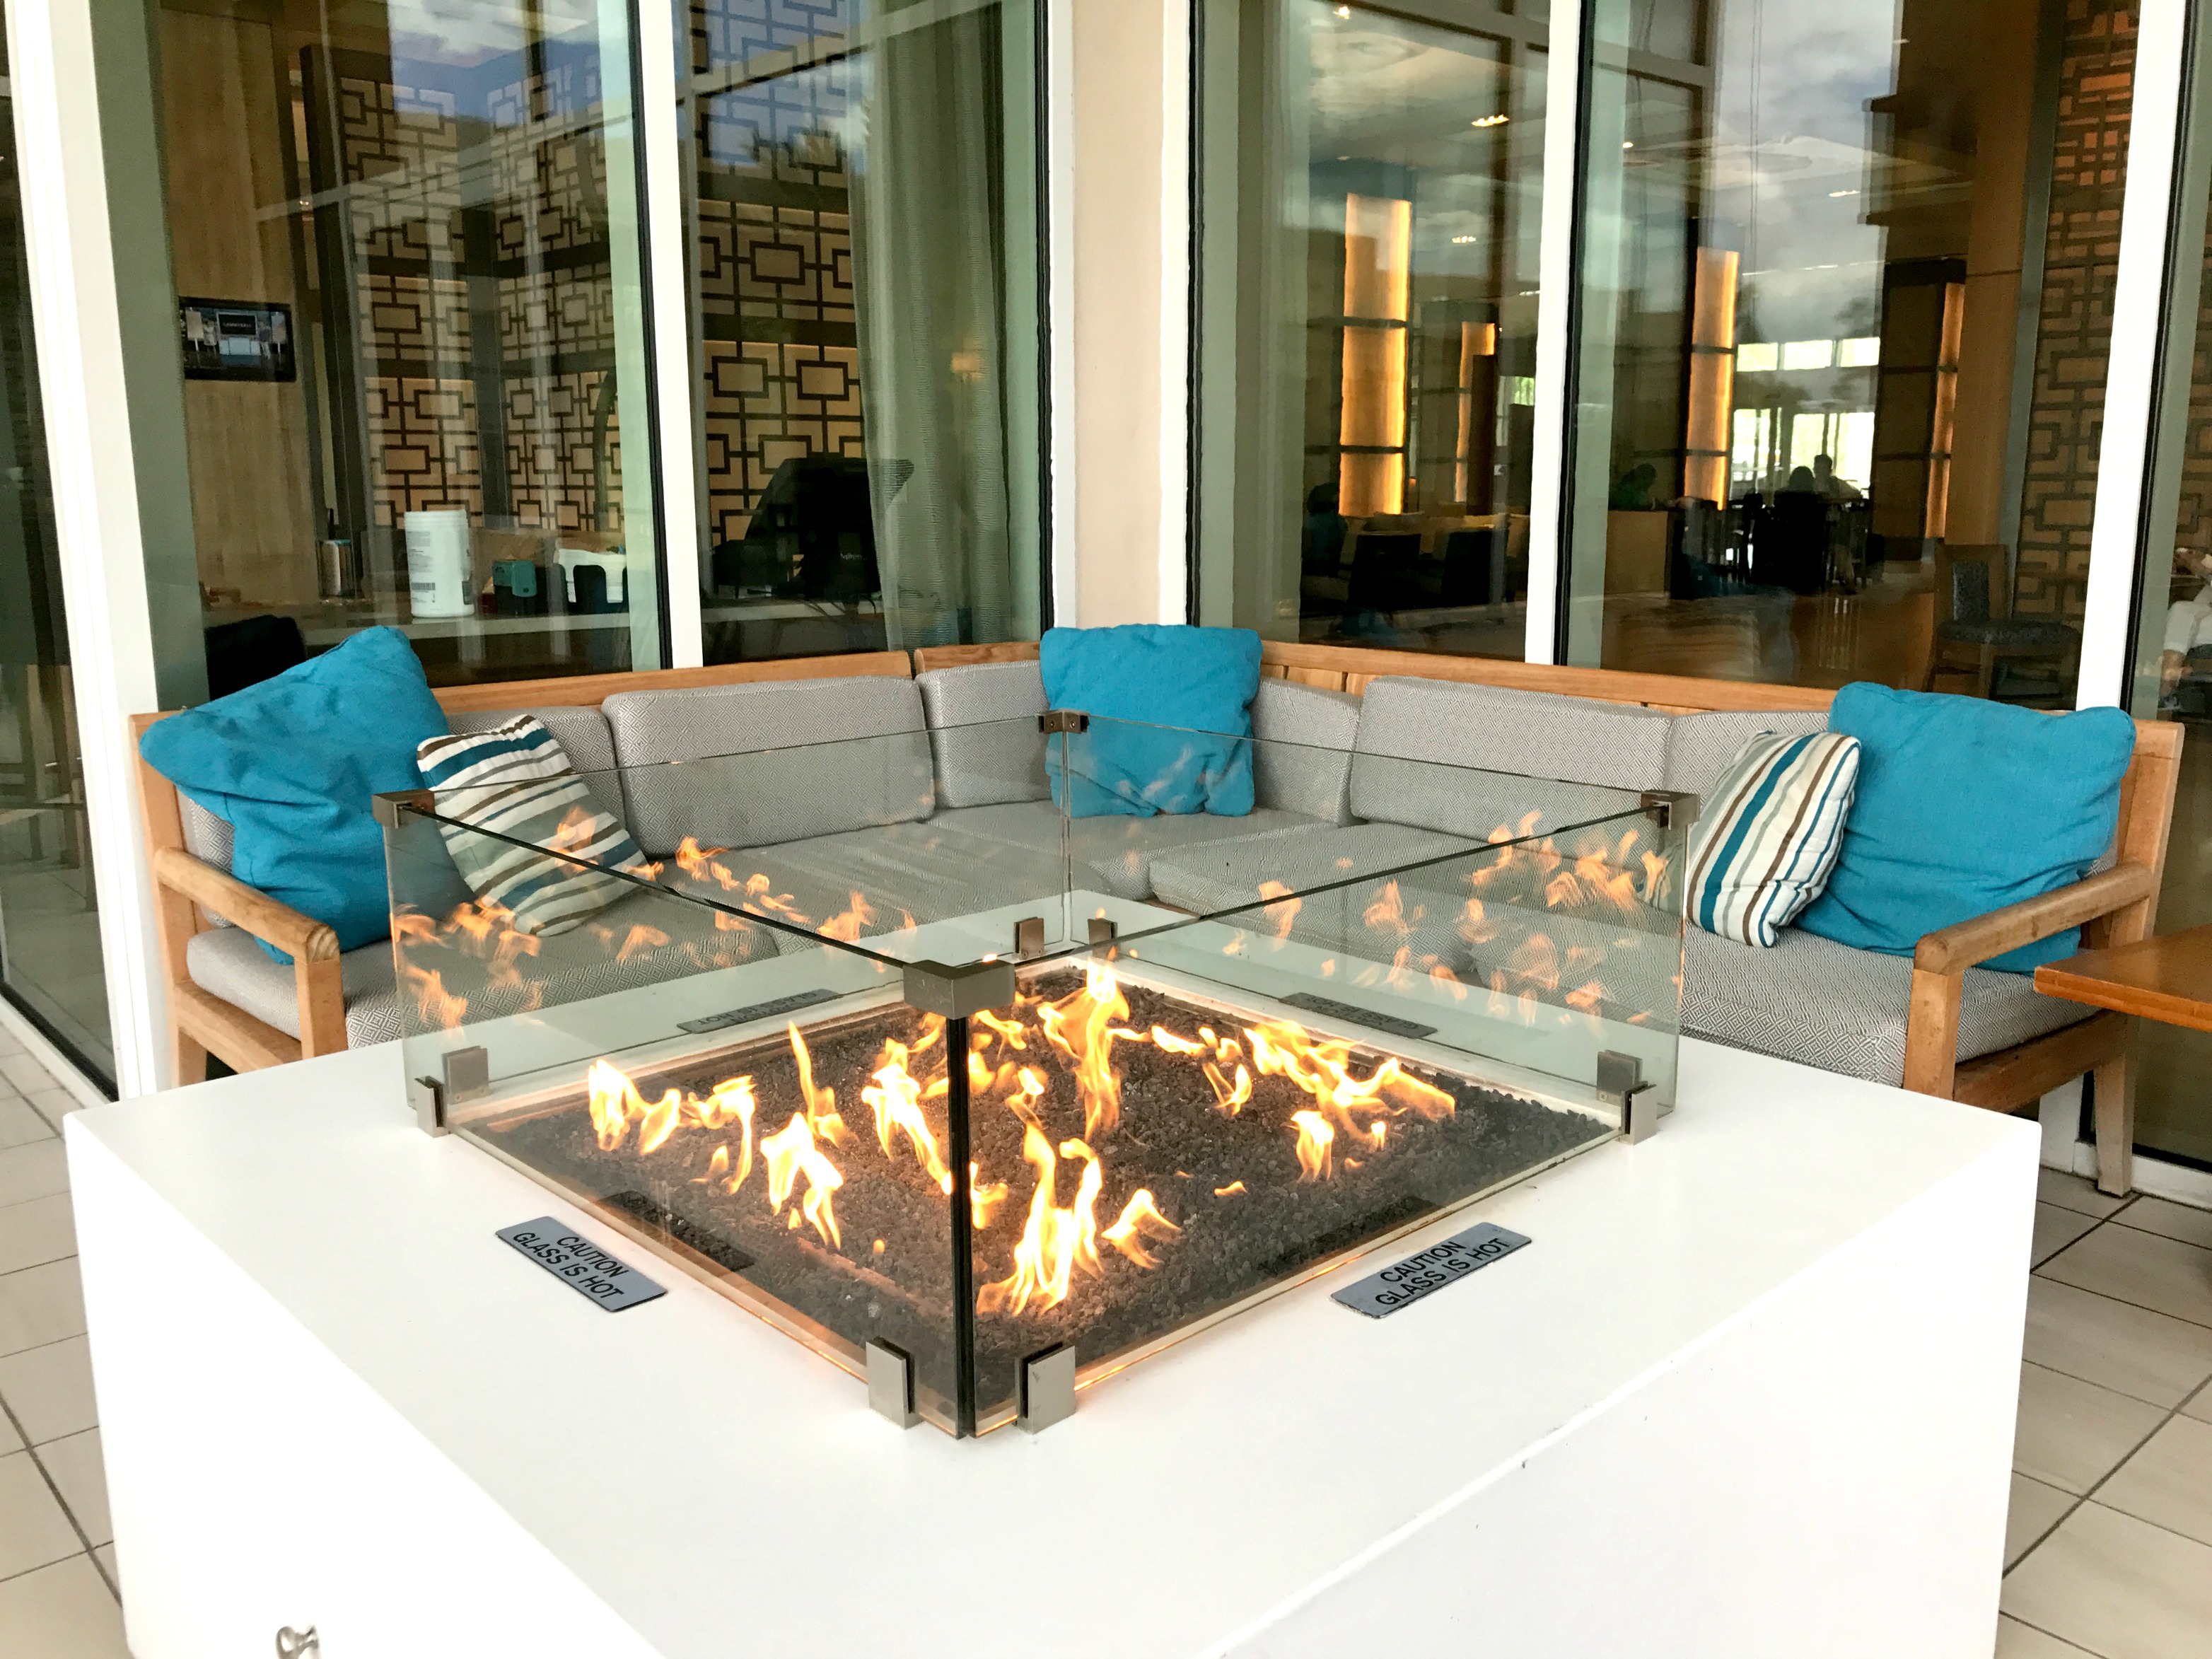 Hilton-bonnet-vista-disney-orlando-resort-fire-pit